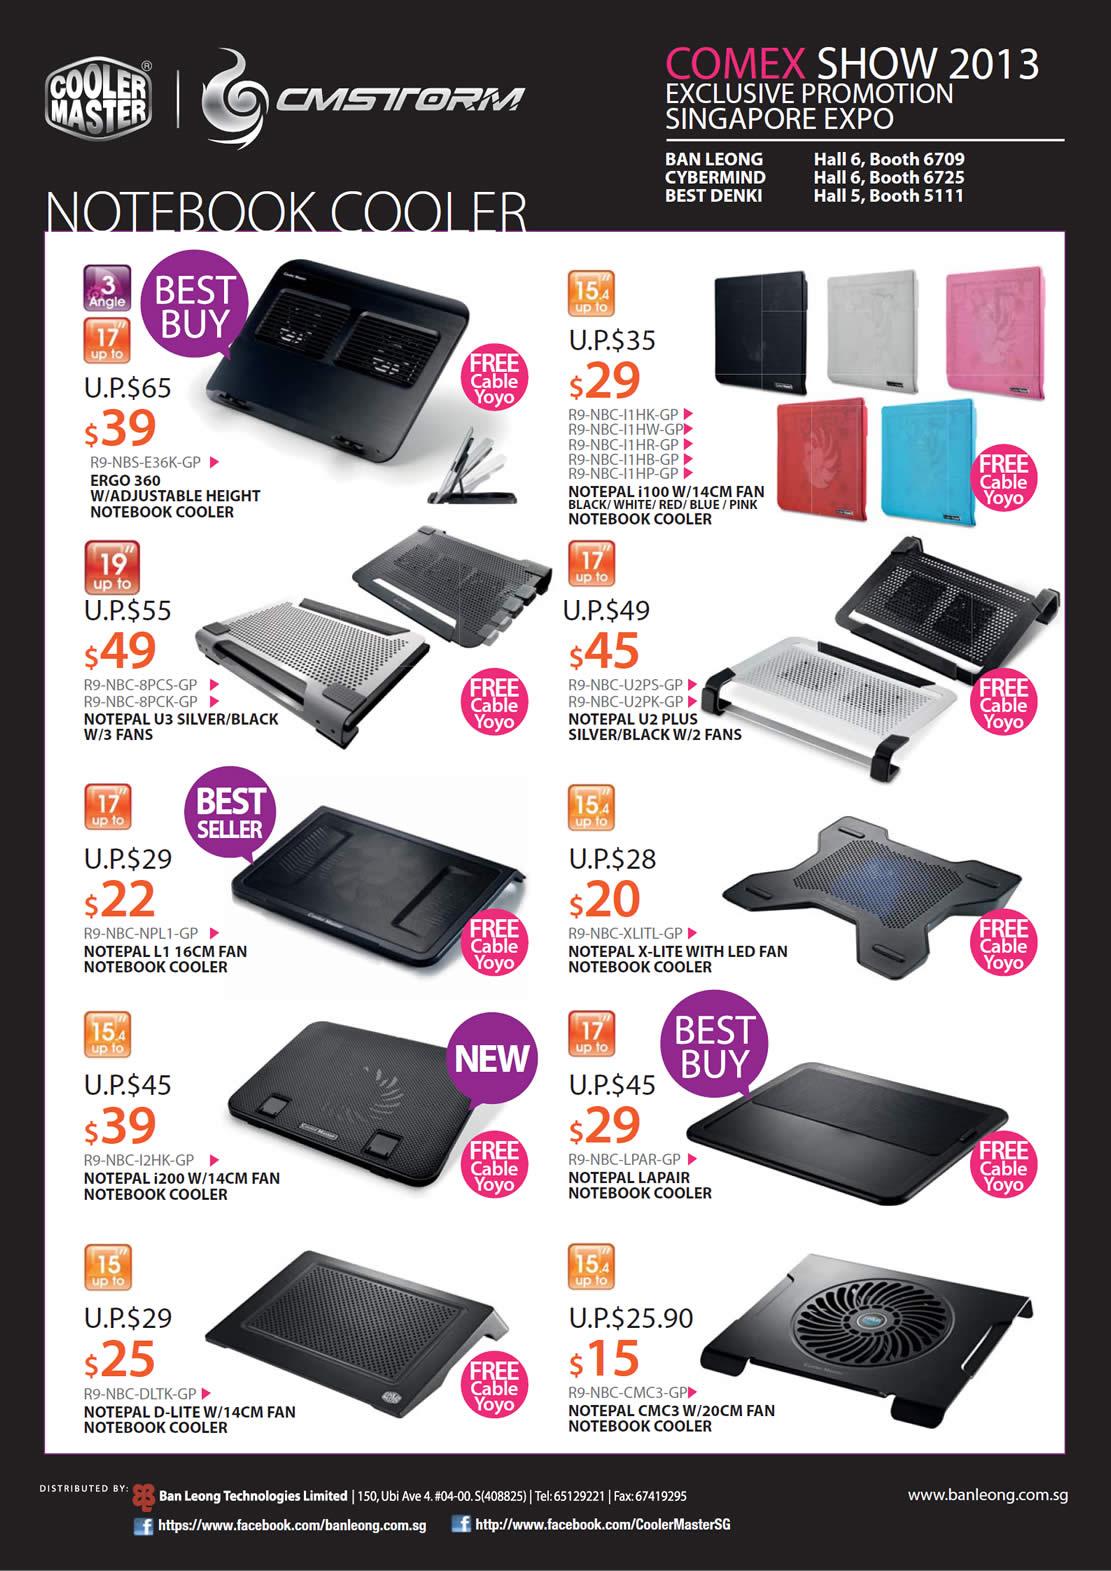 COMEX 2013 price list image brochure of Cooler Master CMStorm Ban Leong Cybermind Best Denki Notebook Coolers, Notepal, Ergo